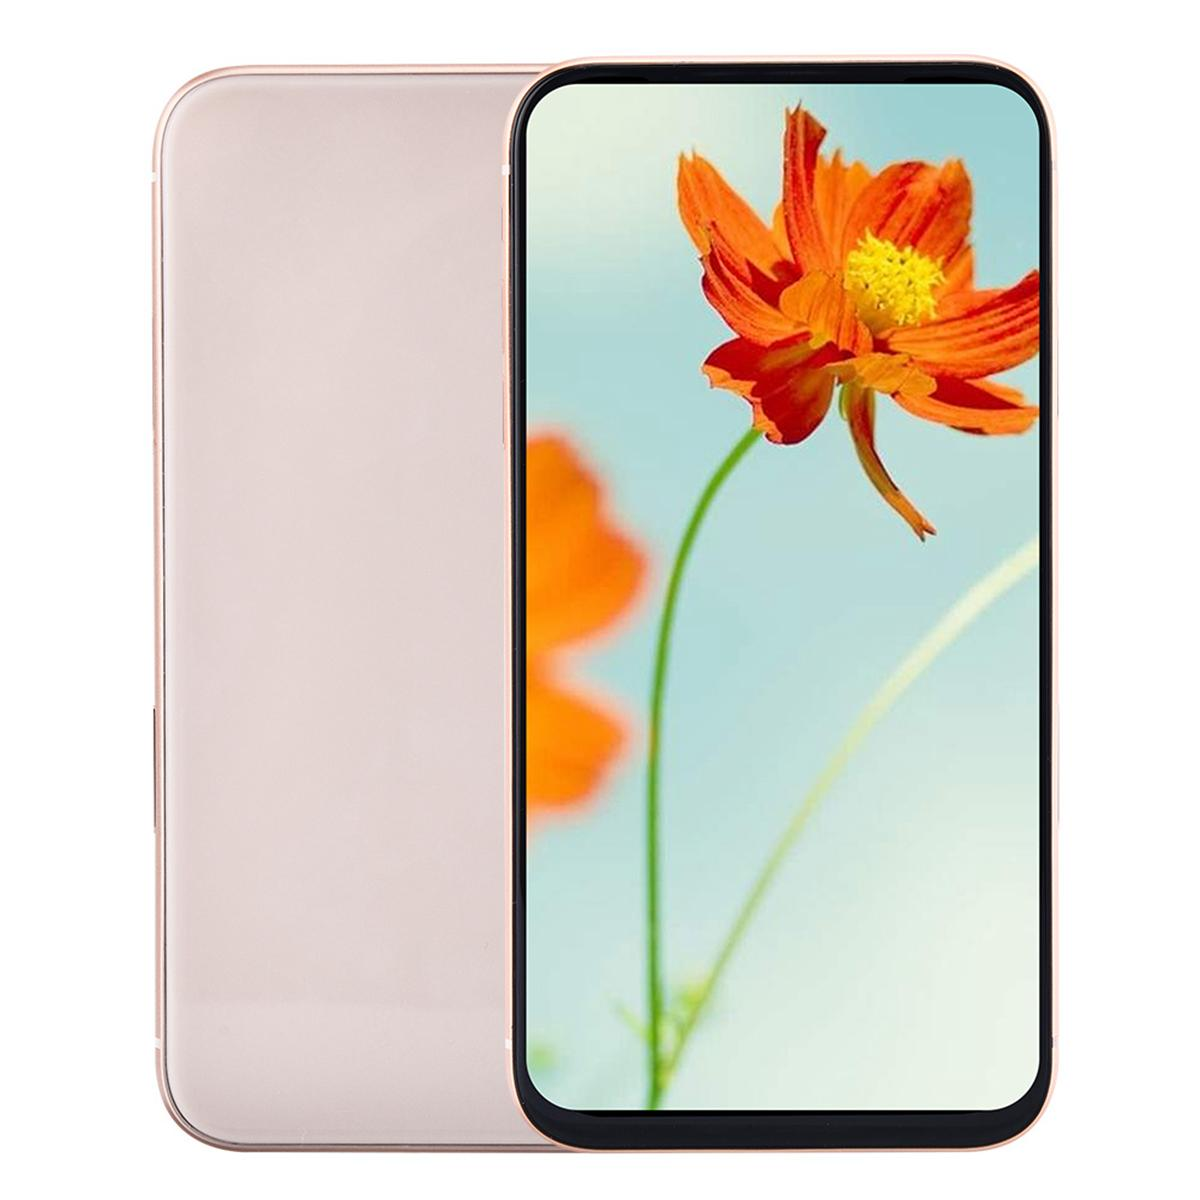 6.5 6.7 inç Tüm Ekran IPS HD + Goophone I12 I11 Pro Max 5g Akıllı Telefon 3g WCDMA Dört Çekirdekli 2 GB 16 GB Android 10 Yüz ID Kablosuz Şarj GPS 13.0MP Kamera Akıllı Telefon Grafit